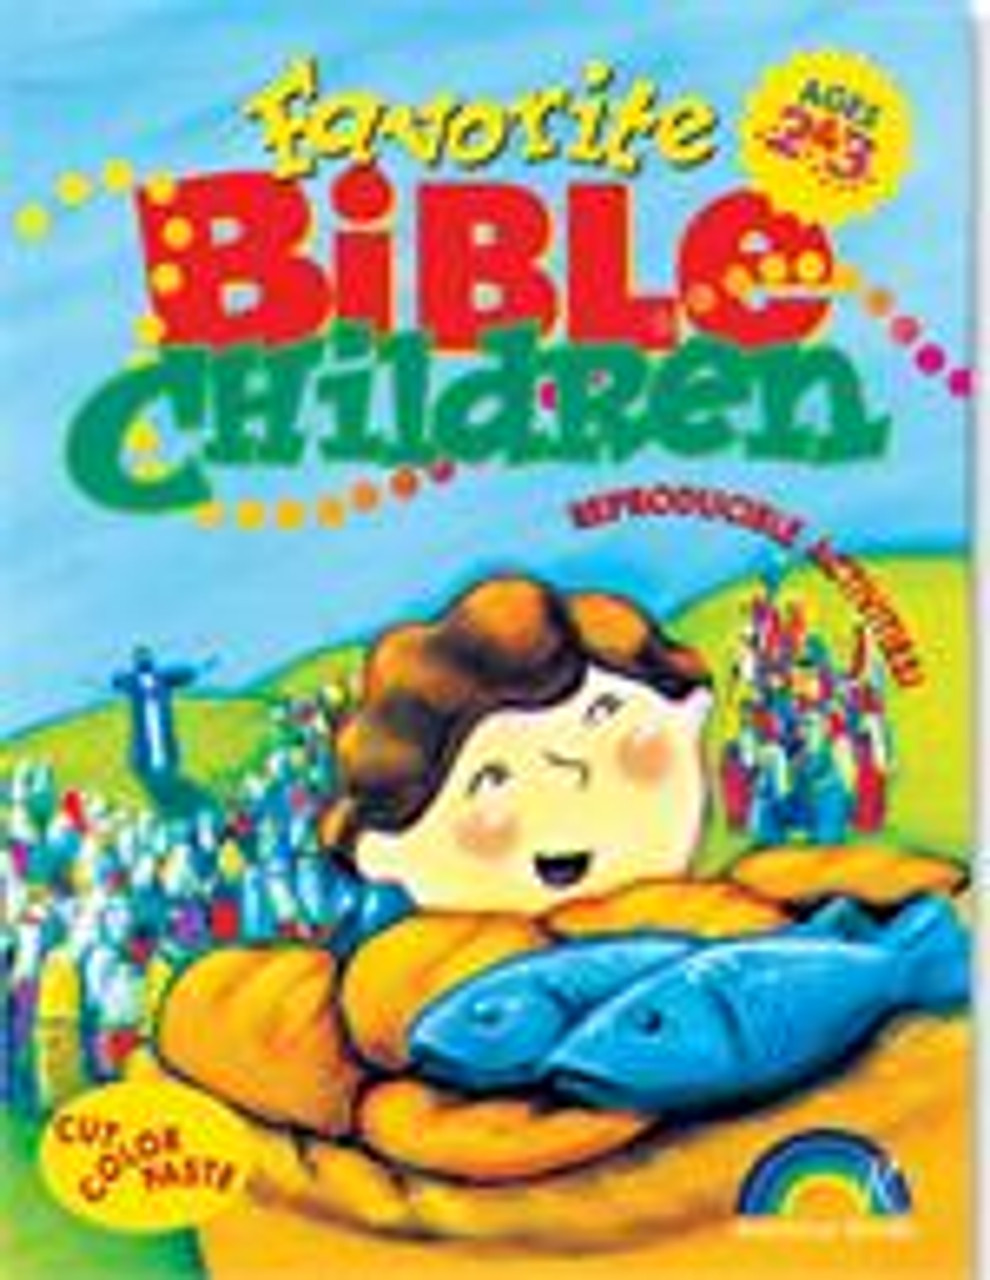 Favorite Bible Children - Ages 2&3